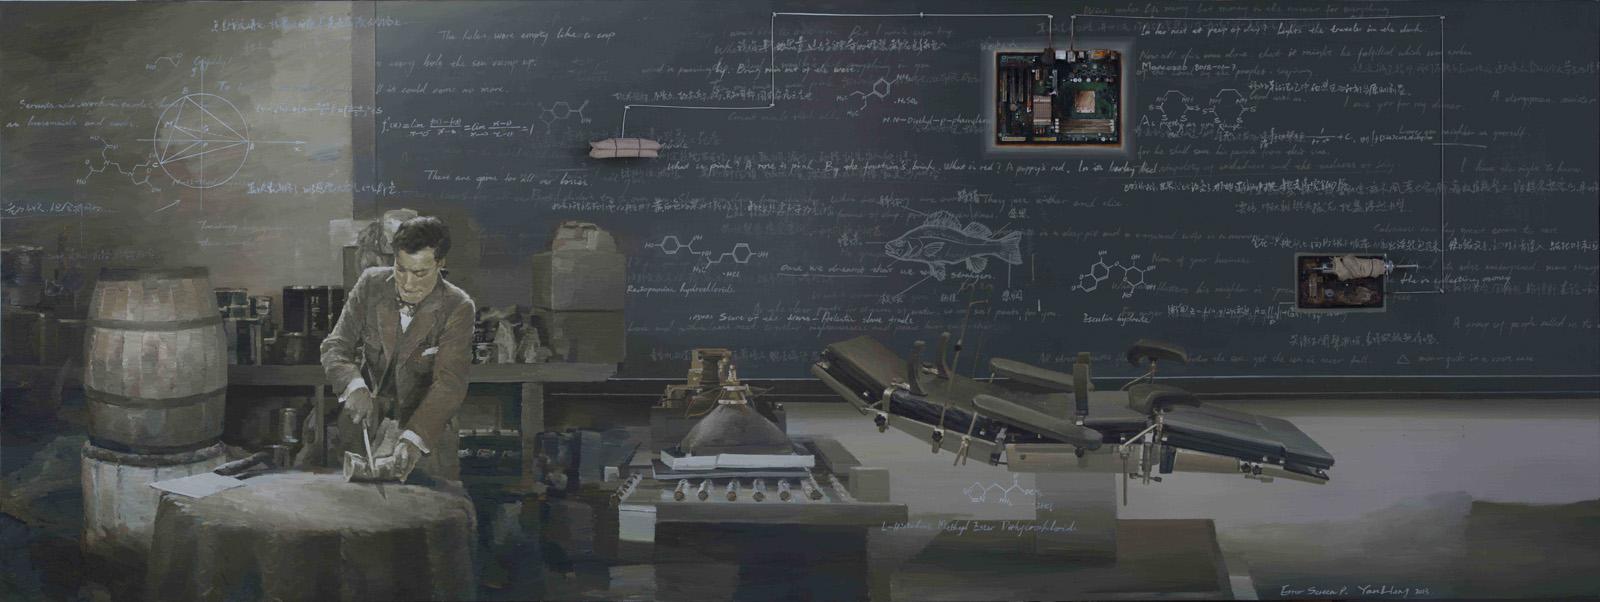 Yan Heng 闫珩, Black Screen No.9 黑屏 9, 2013, Mixed media and oil on canvas 布面油画装置, 150 x 400 cm